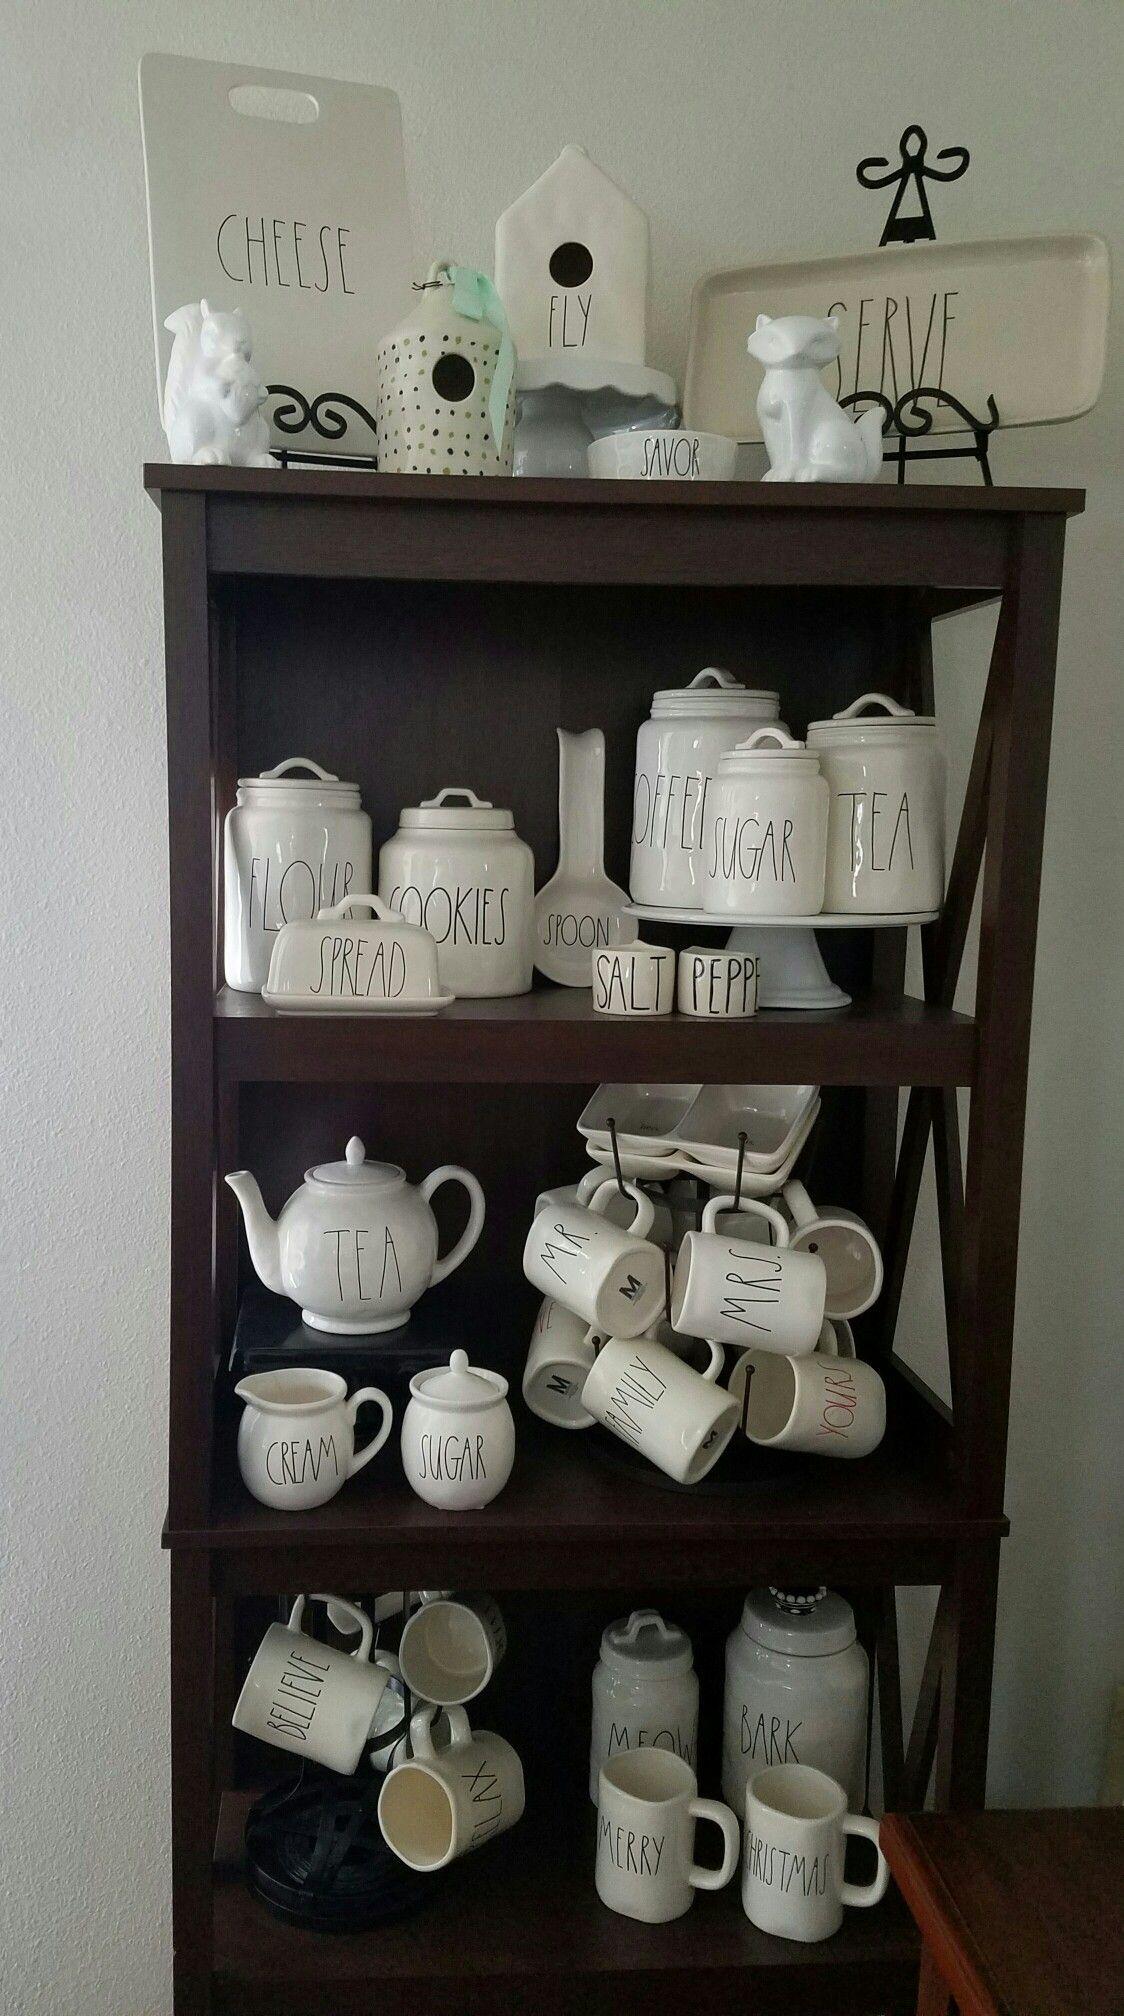 My Updated Rae Dunn Collection | Rae Dunn | Pinterest | kostenlose ...